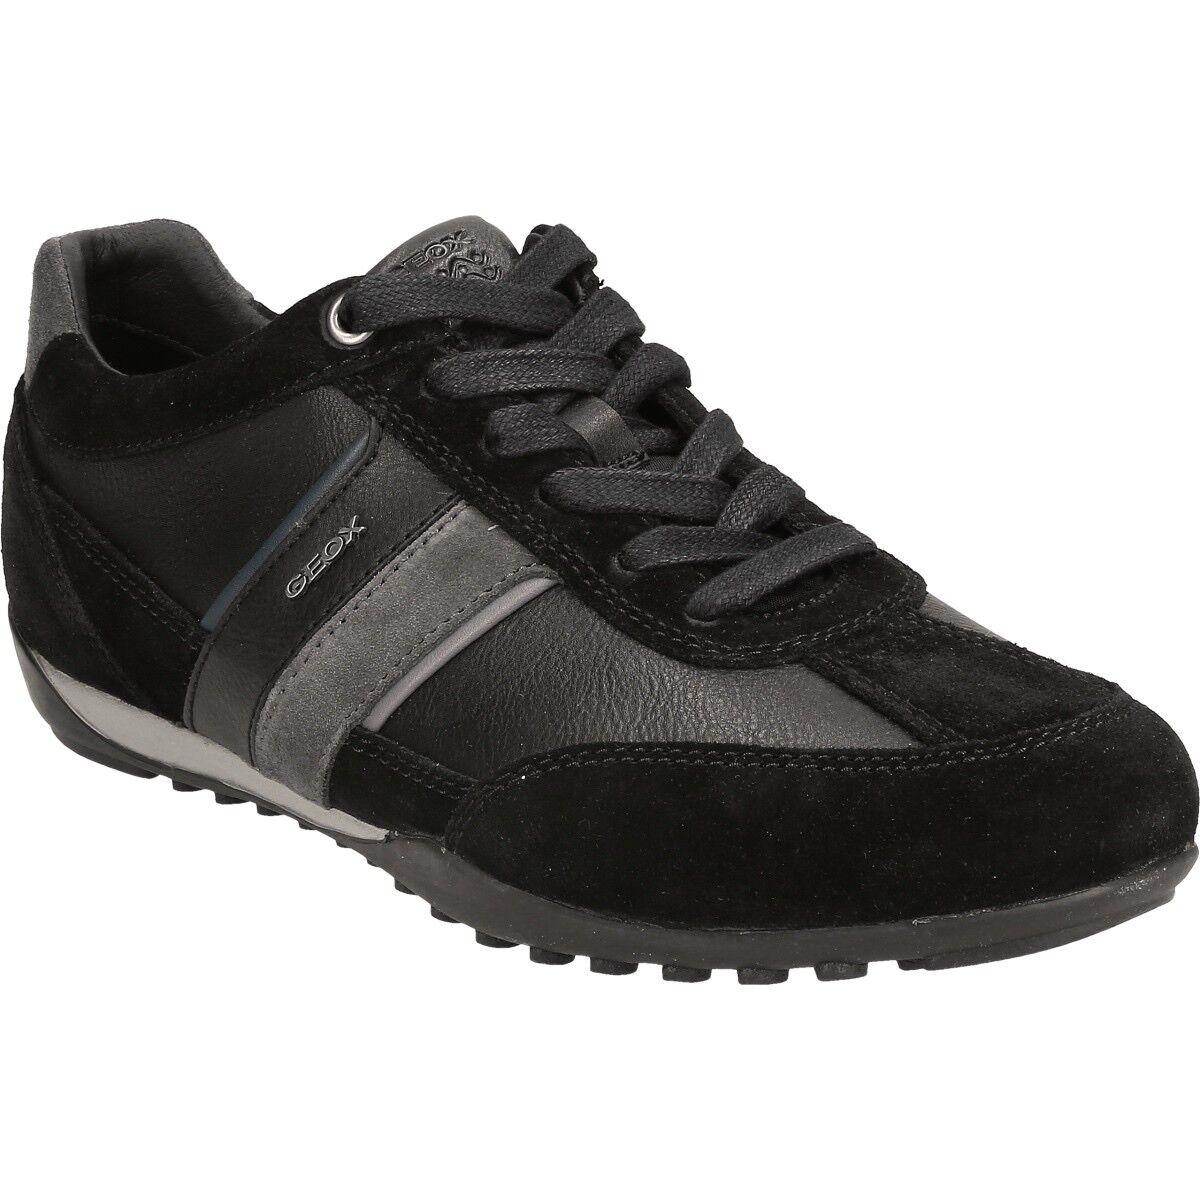 GEOX GEOX GEOX RESPIRA Messieurs U Wells C Lowtop Baskets Chaussures Basses u52t5c Noir 656a64